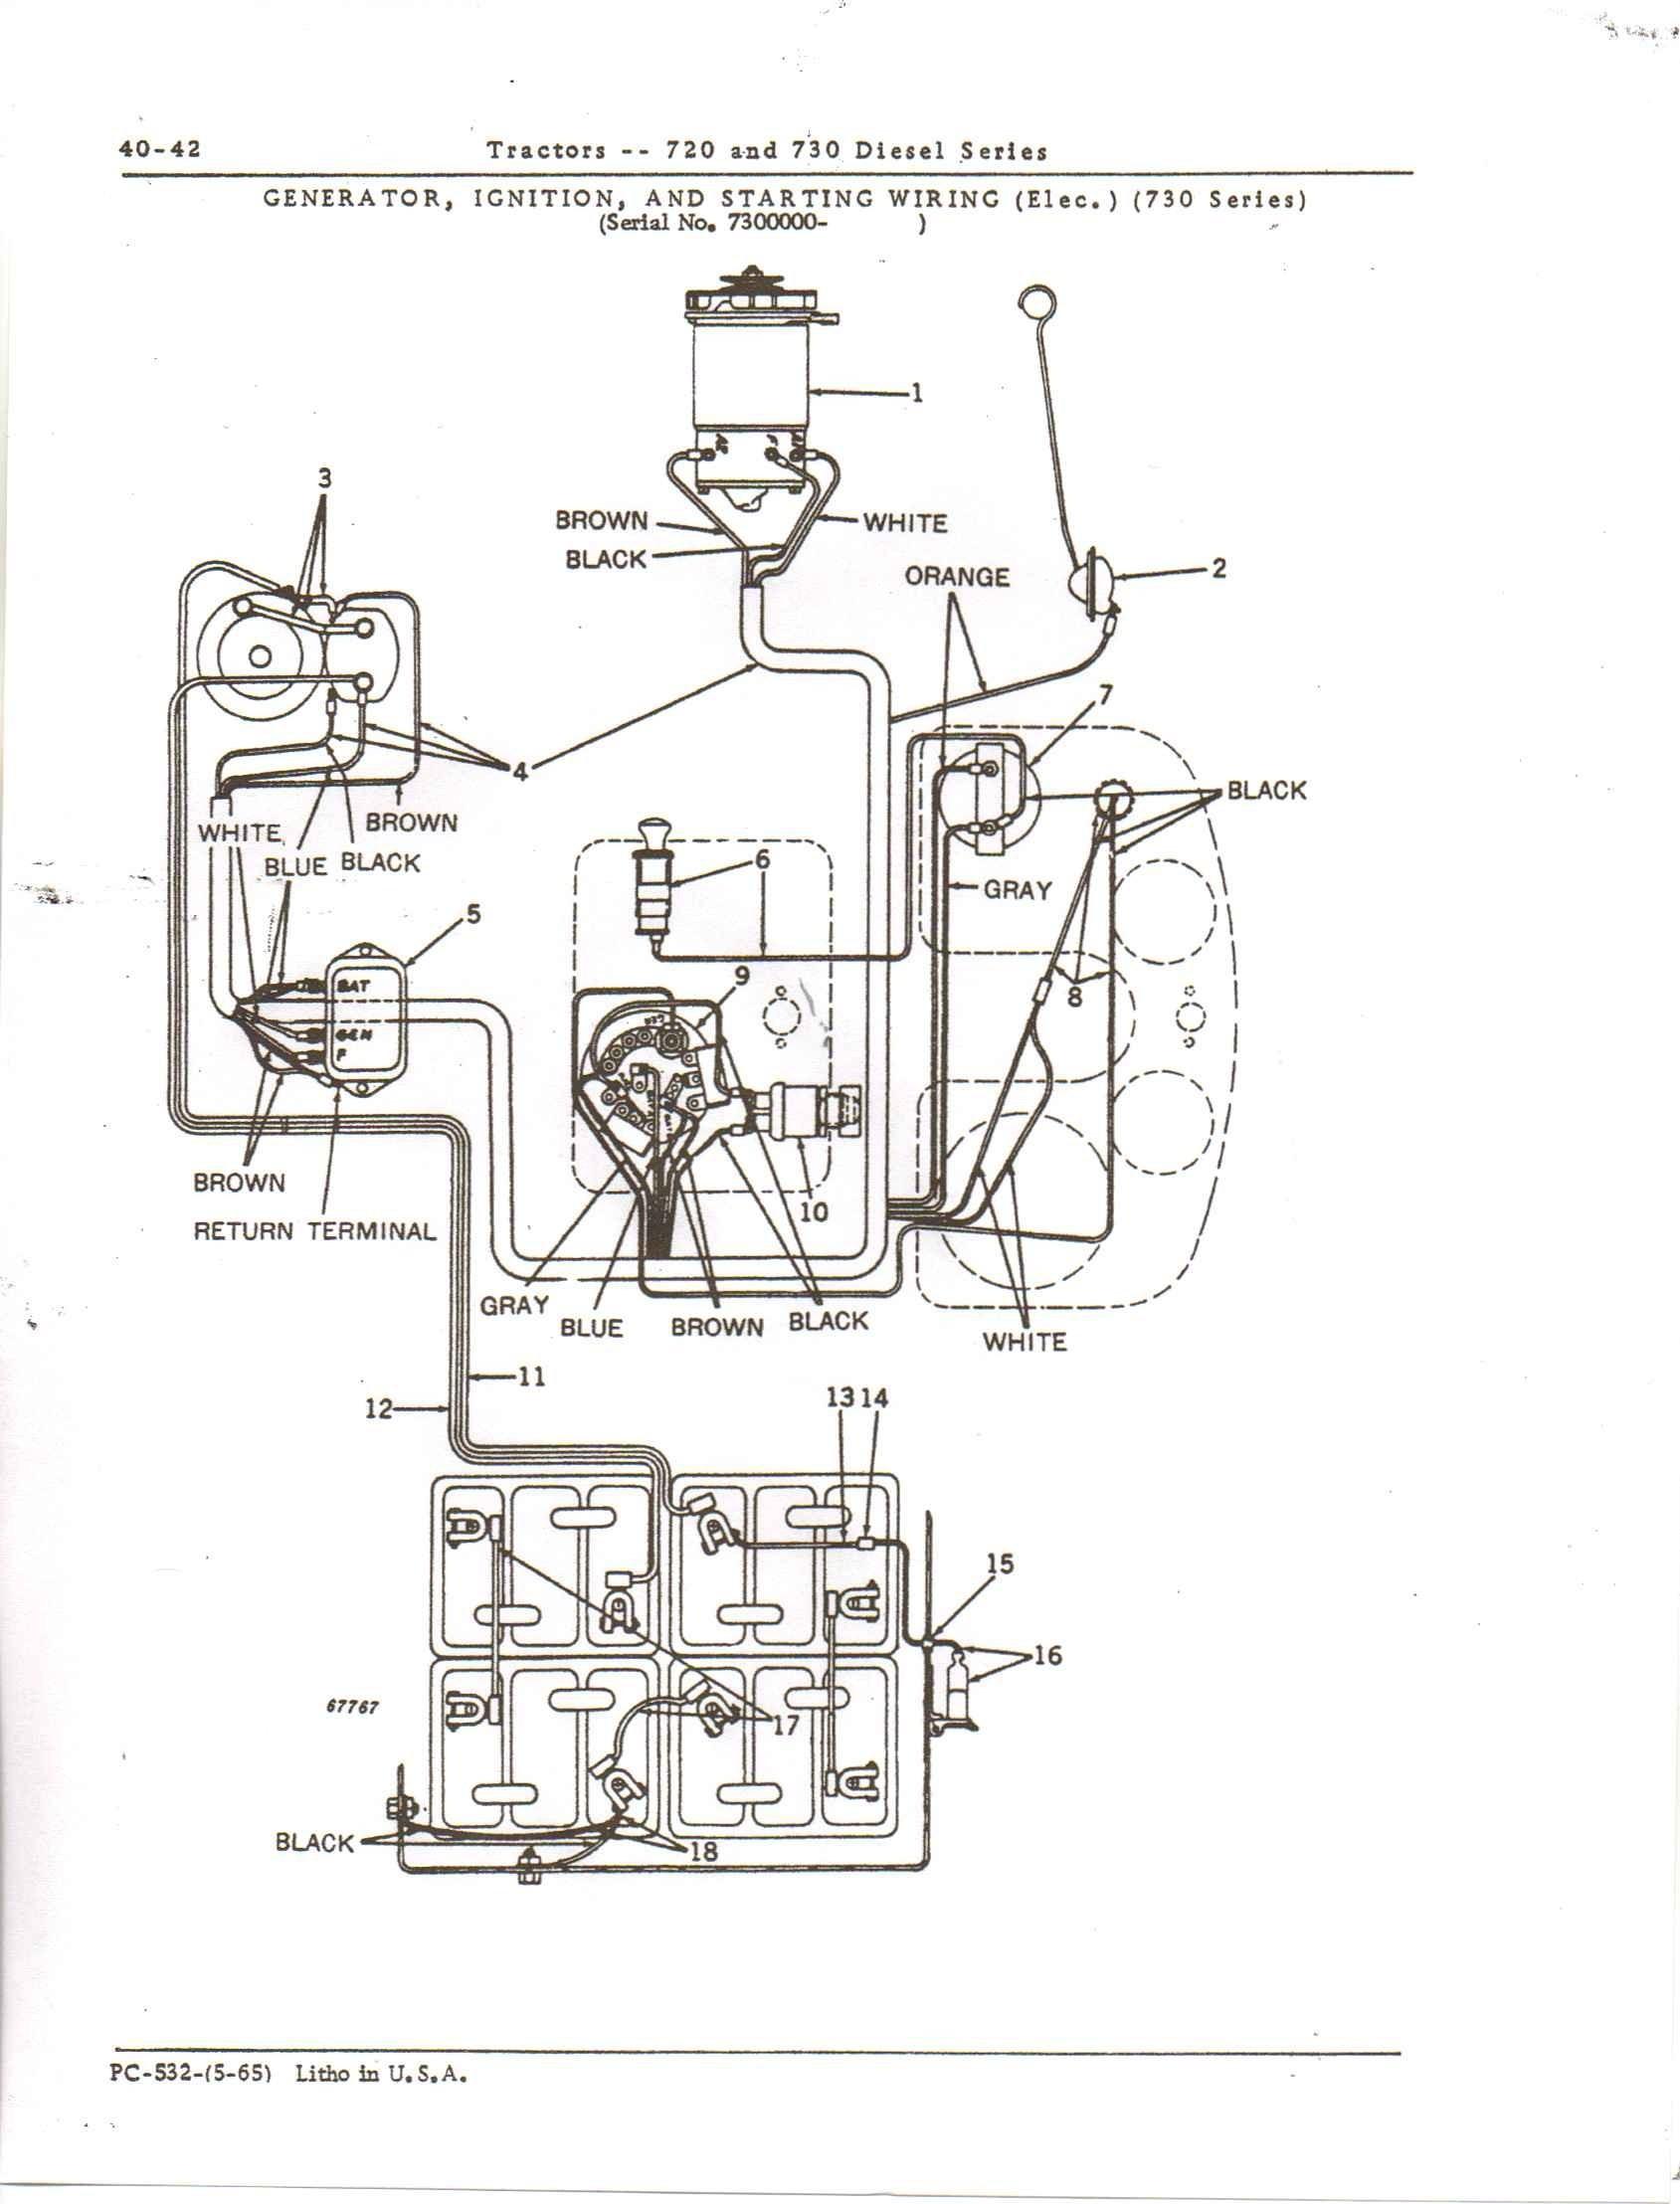 john deere l120 deck parts diagram awesome john deere sabre riding mower wiring diagram diy enthusiasts of john deere l120 deck parts diagram